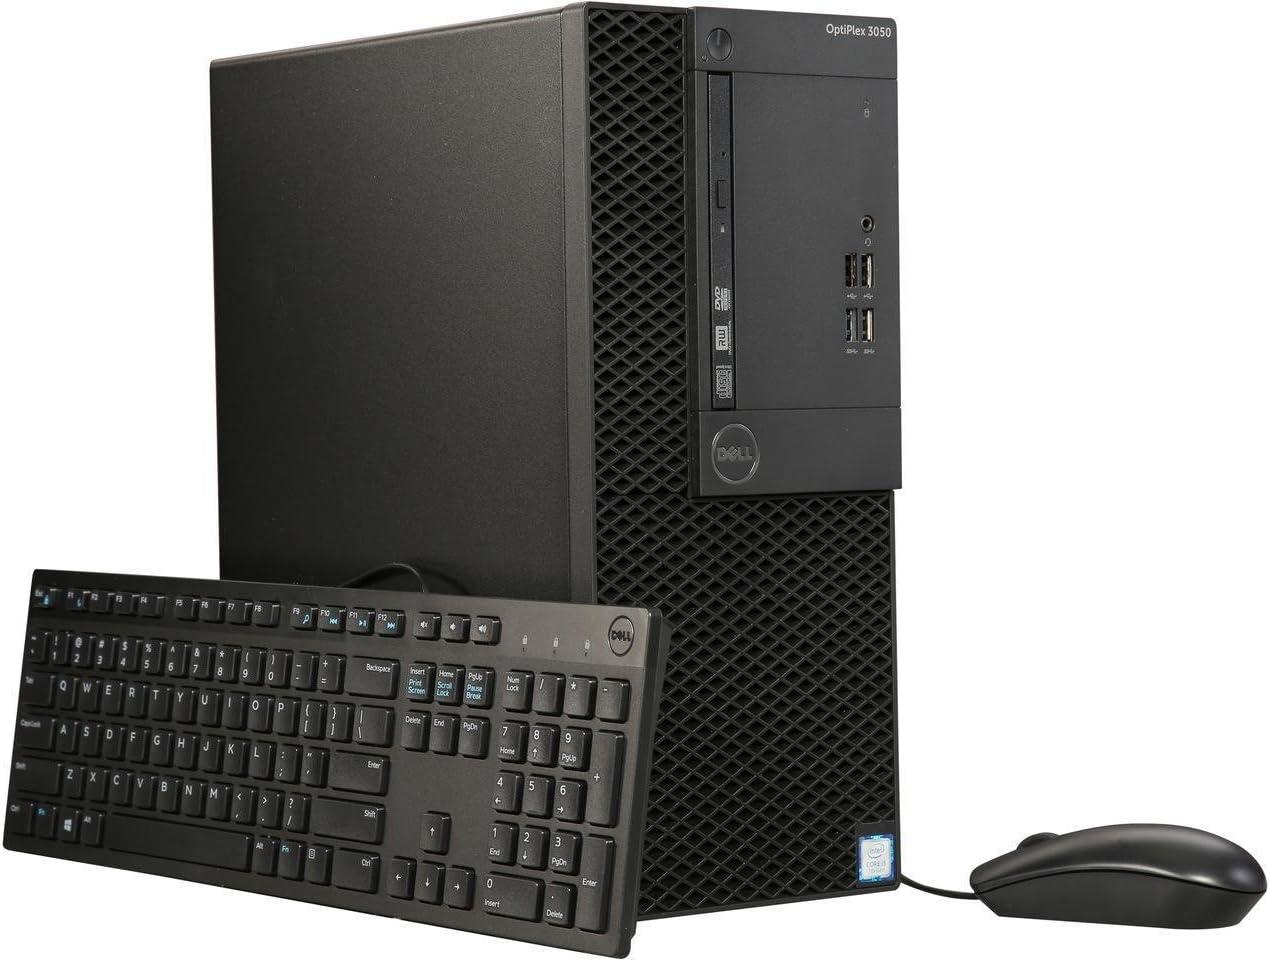 Dell OptiPlex Mini Tower (MT) Business Desktop PC, Intel i5-7500 Quad-Core 3.4 GHz, 128GB SSD + 1TB HDD, 8GB DDR4, Ethernet, USB 3.0, DVD±RW, Display Port/HDMI, Windows 10 Pro, includes Keyboard+Mouse